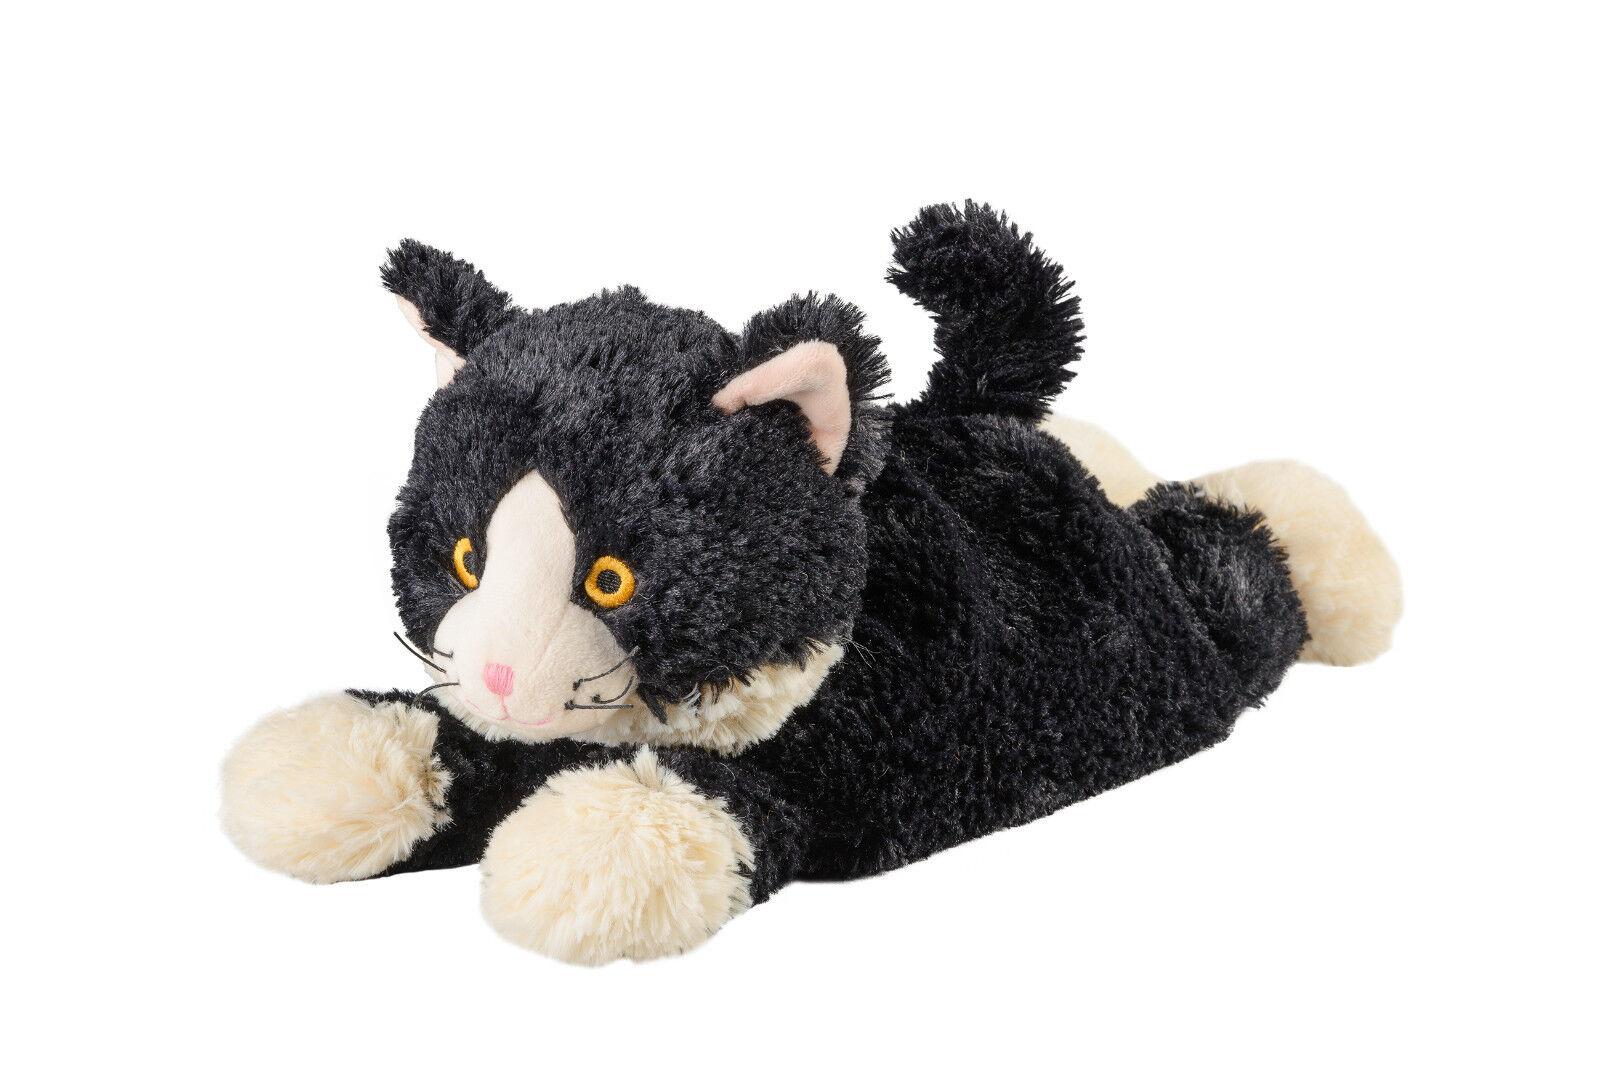 Original Warmies Greenlife Wärmestofftier Wärmekissen Körnerkissen Wärmetier NEU Katze liegend